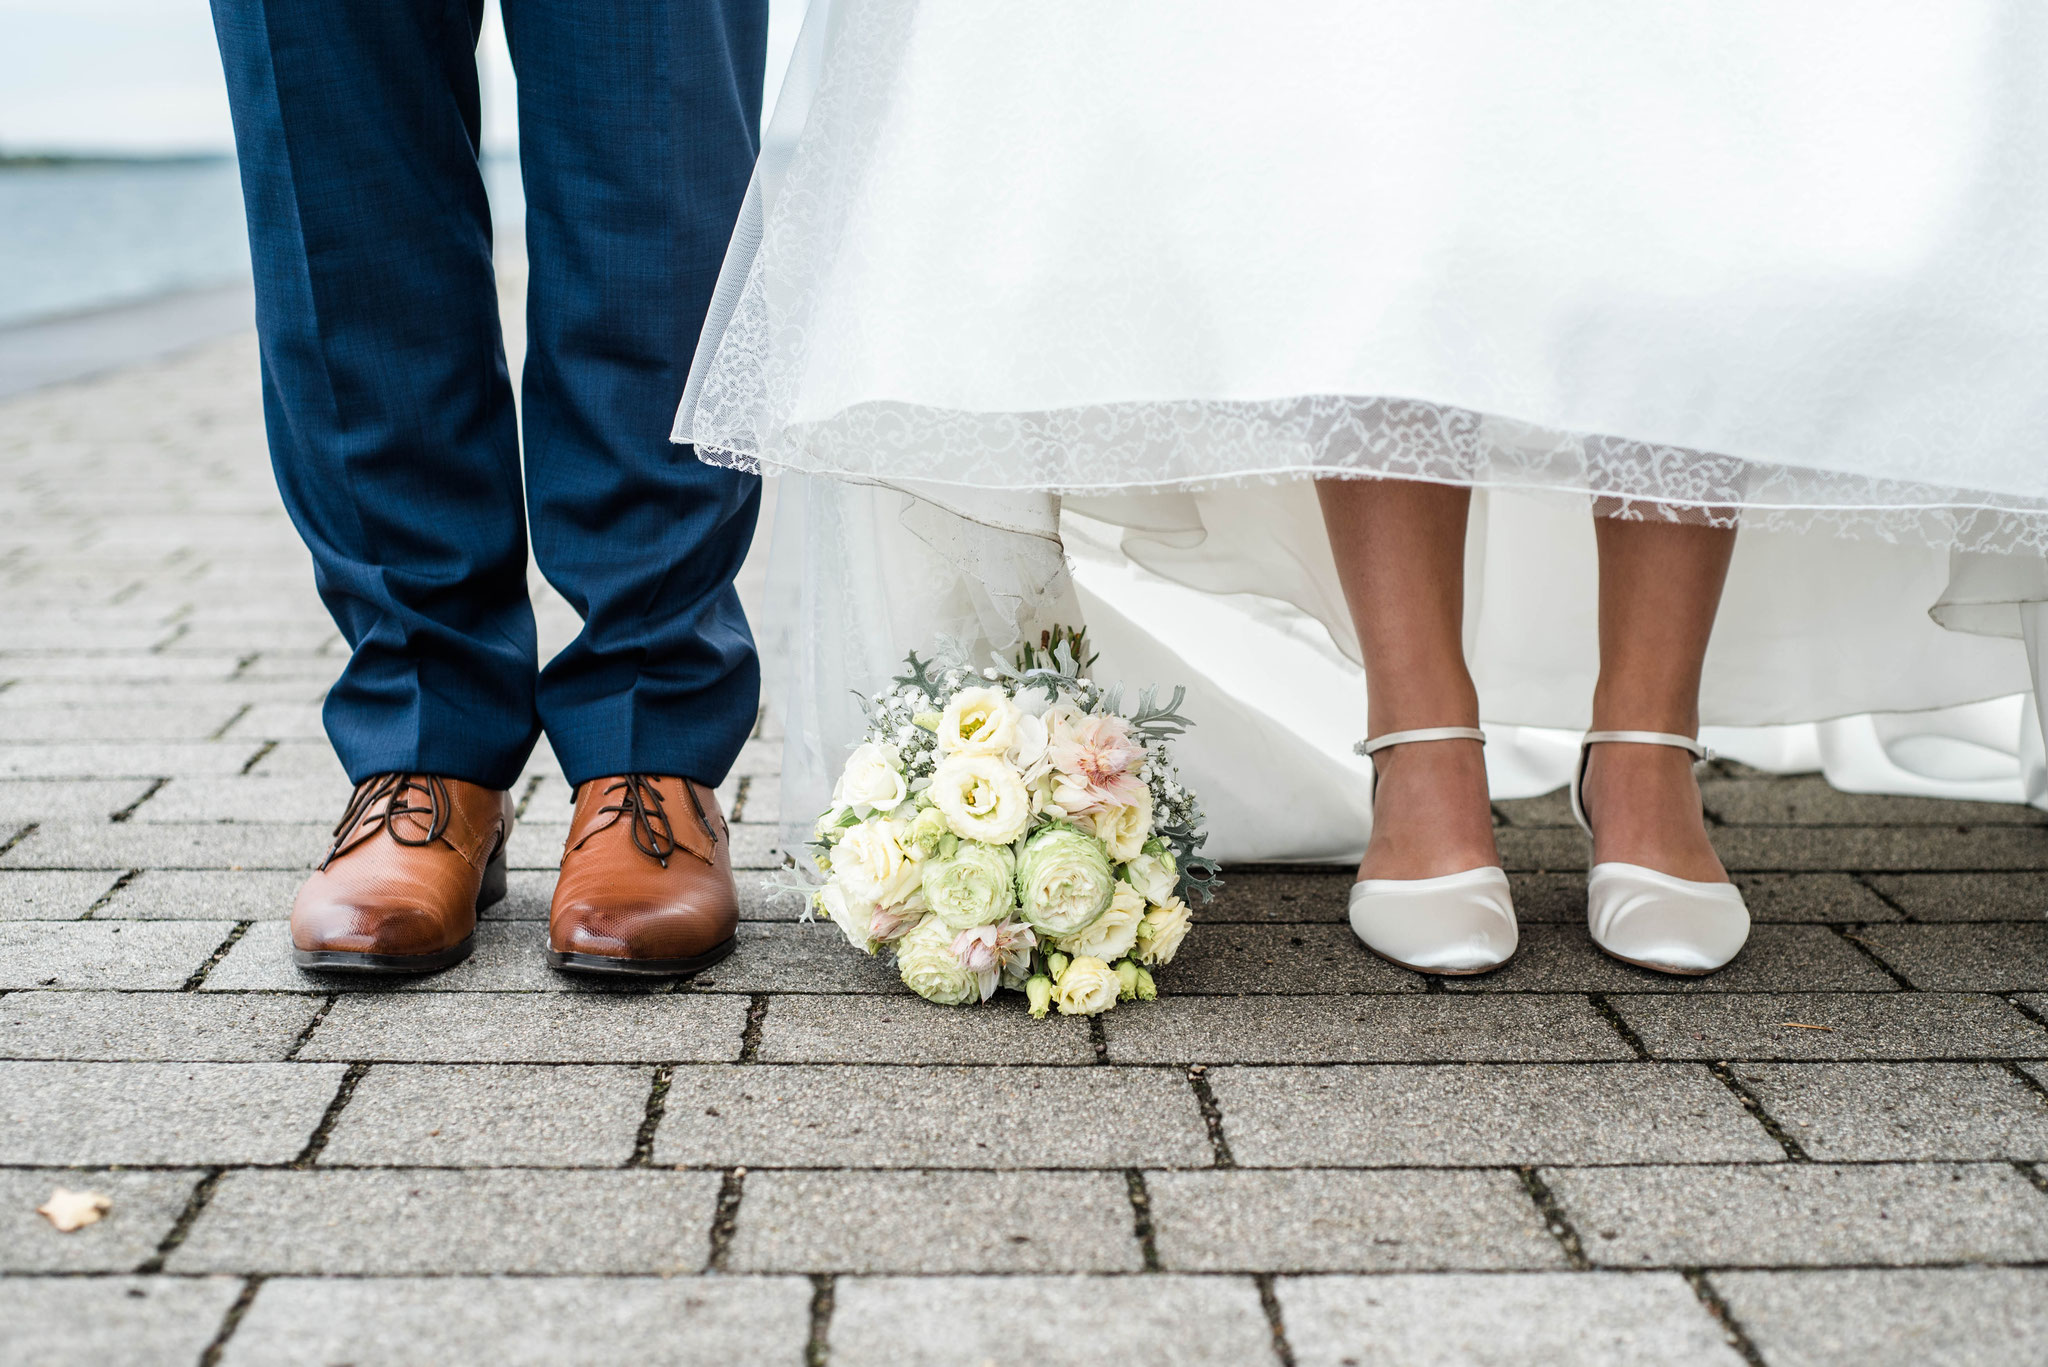 Hochzeitsfotograf Bitterfeld, Villa am Bernsteinsee in Bitterfeld, Hochzeitsfotos am See